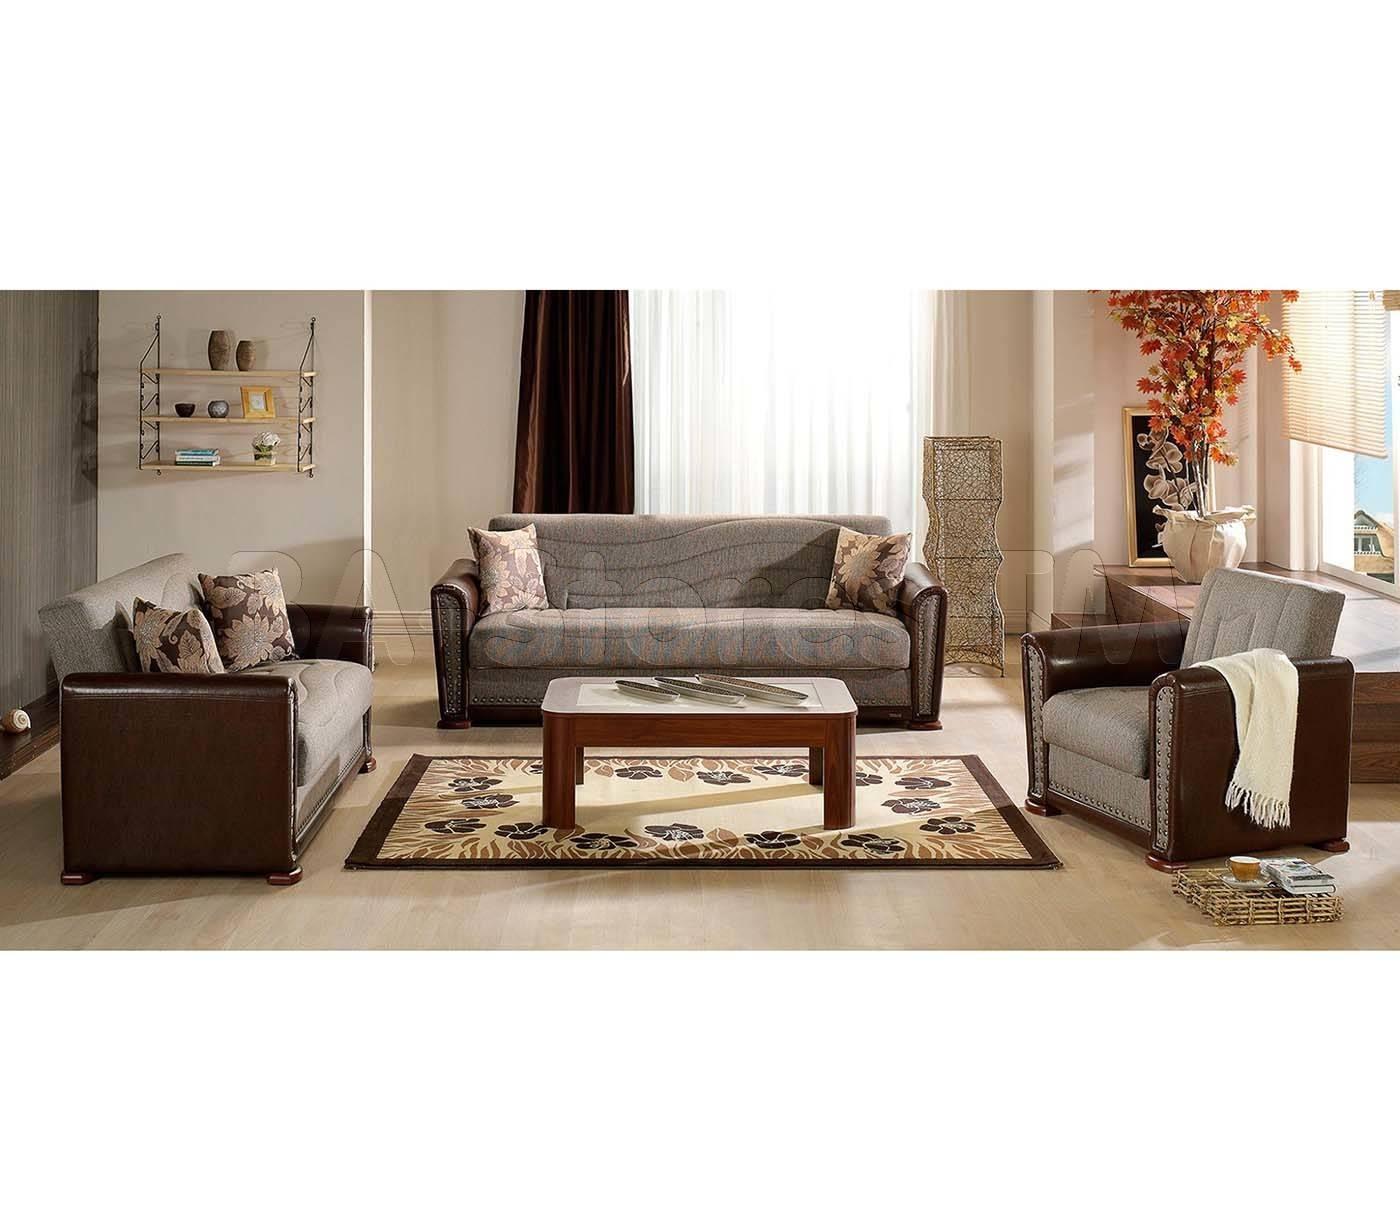 Cindy Crawford Home Sofa 33 With Cindy Crawford Home Sofa inside Cindy Crawford Home Sofas (Image 5 of 15)